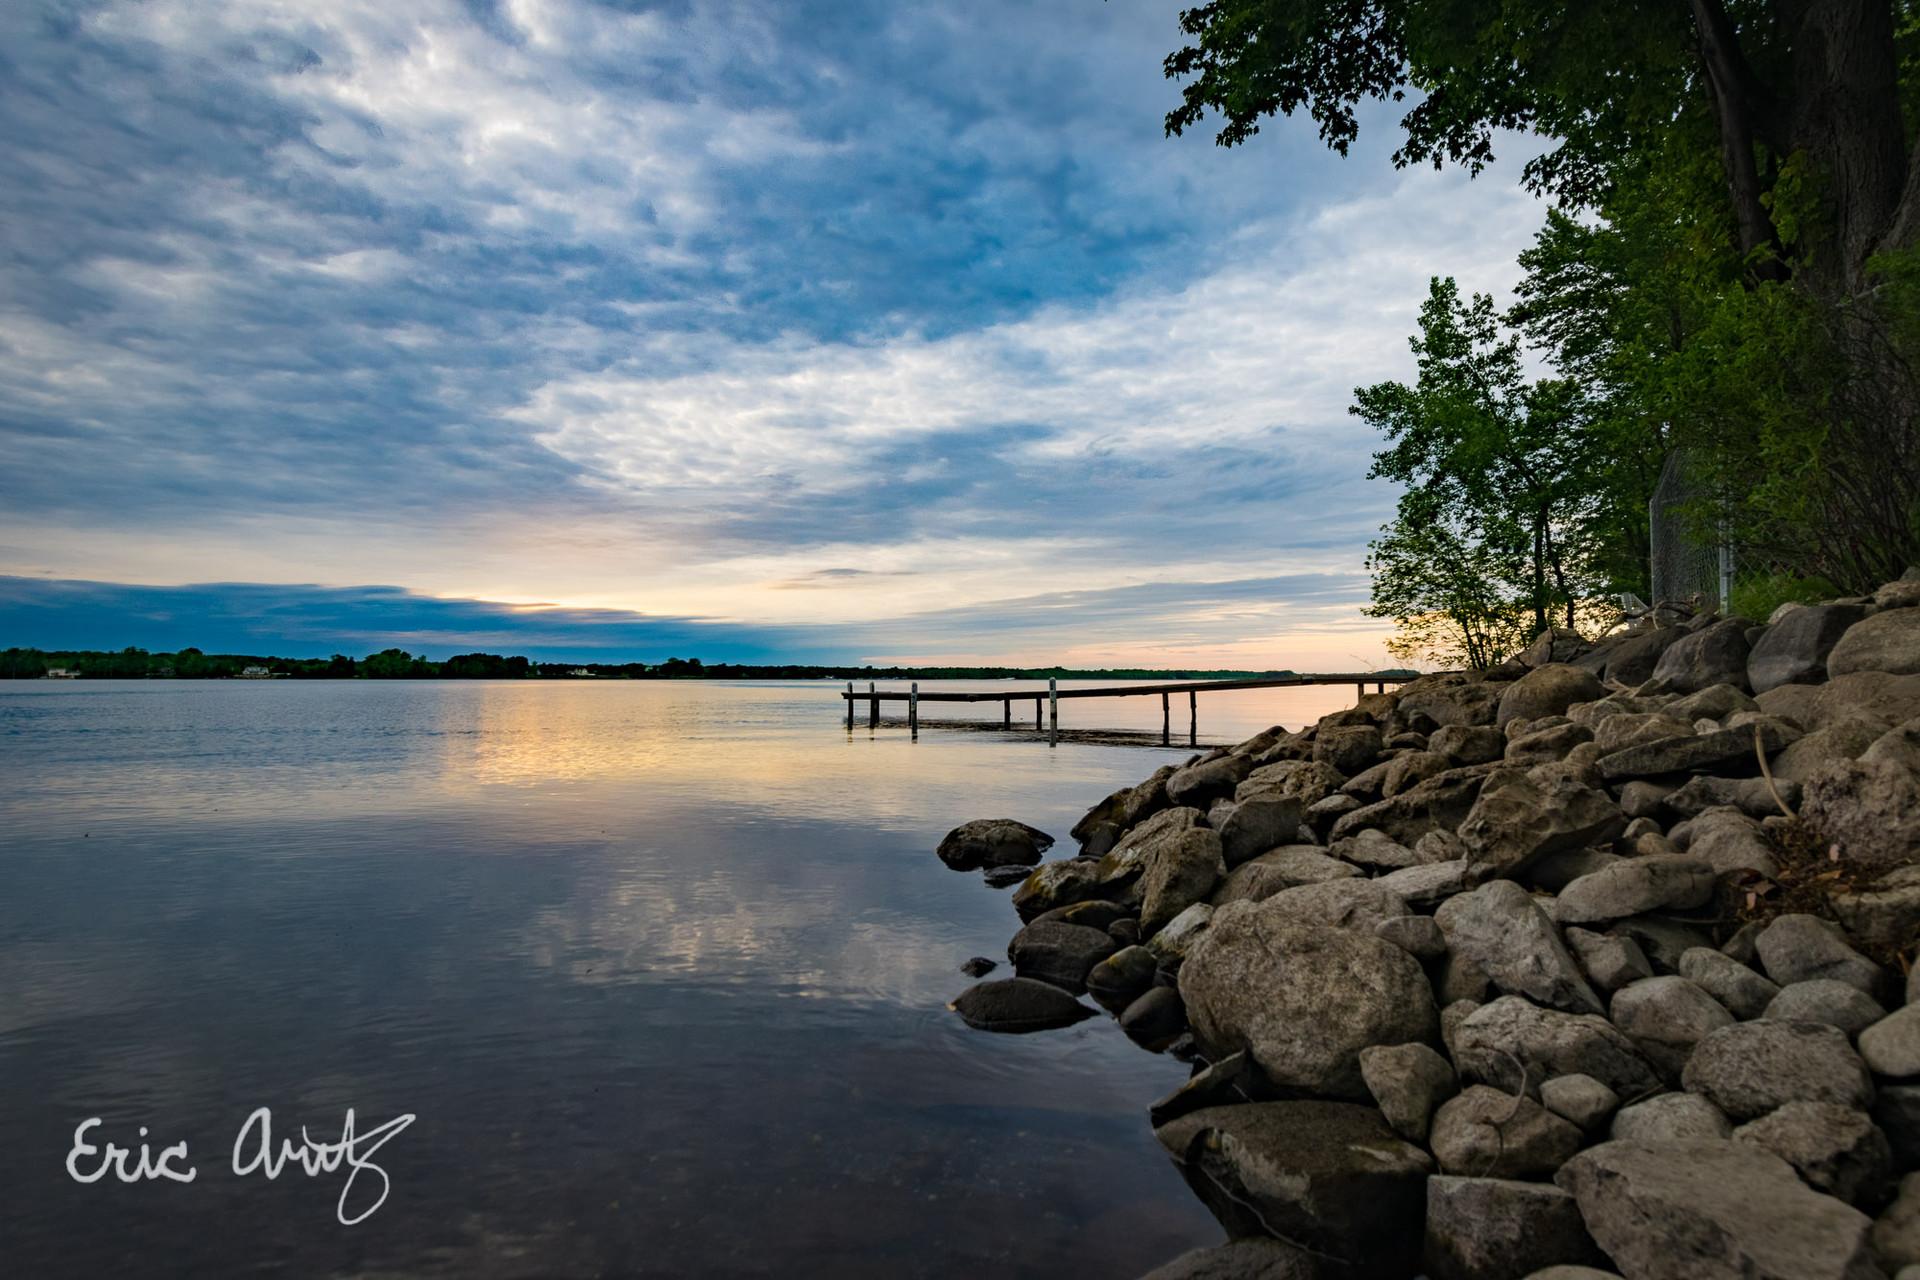 Peaceful Sunset, Lake Champlain